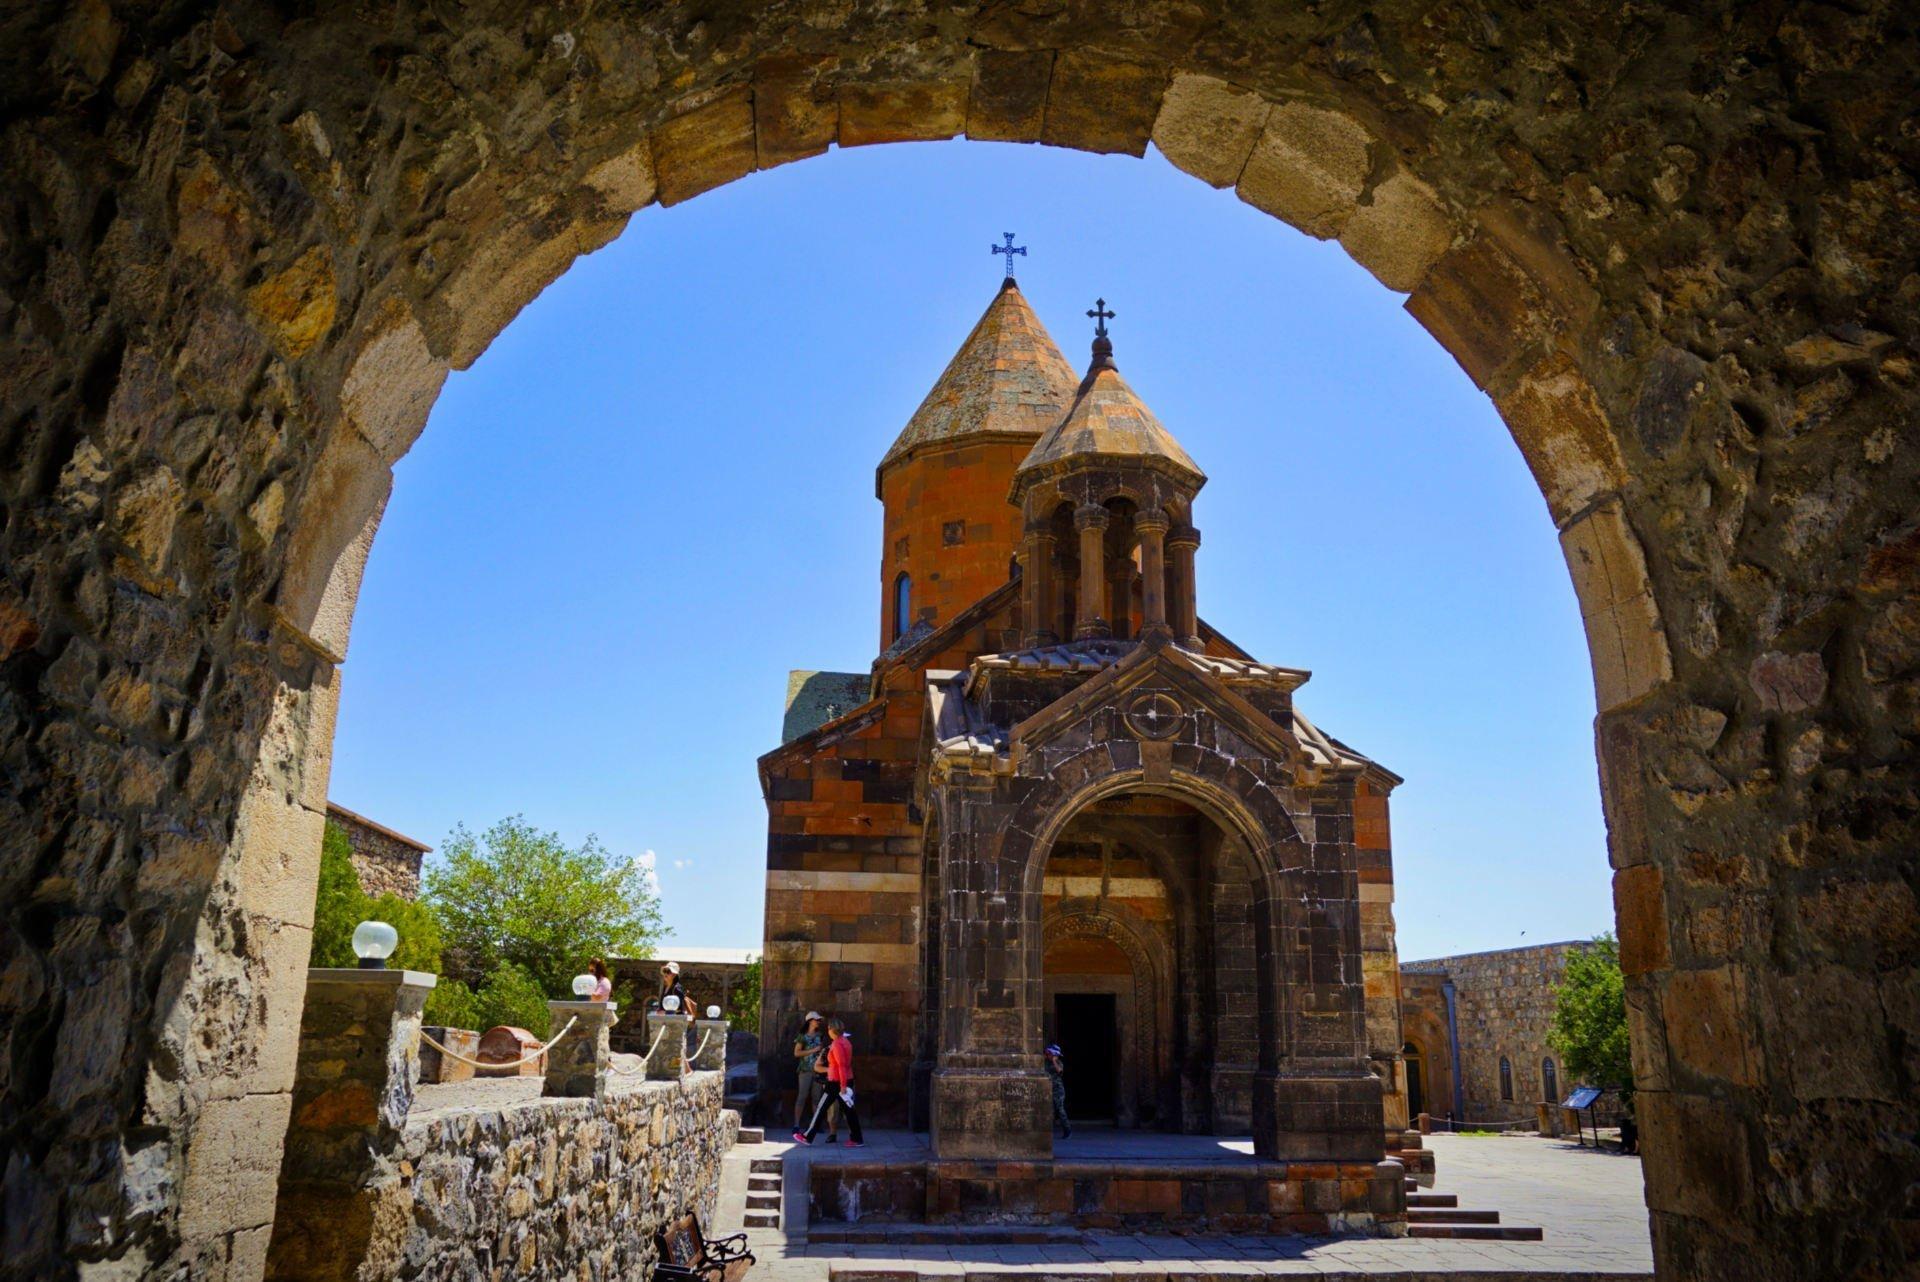 Khor Virap, Armenia - Experiencing the Globe